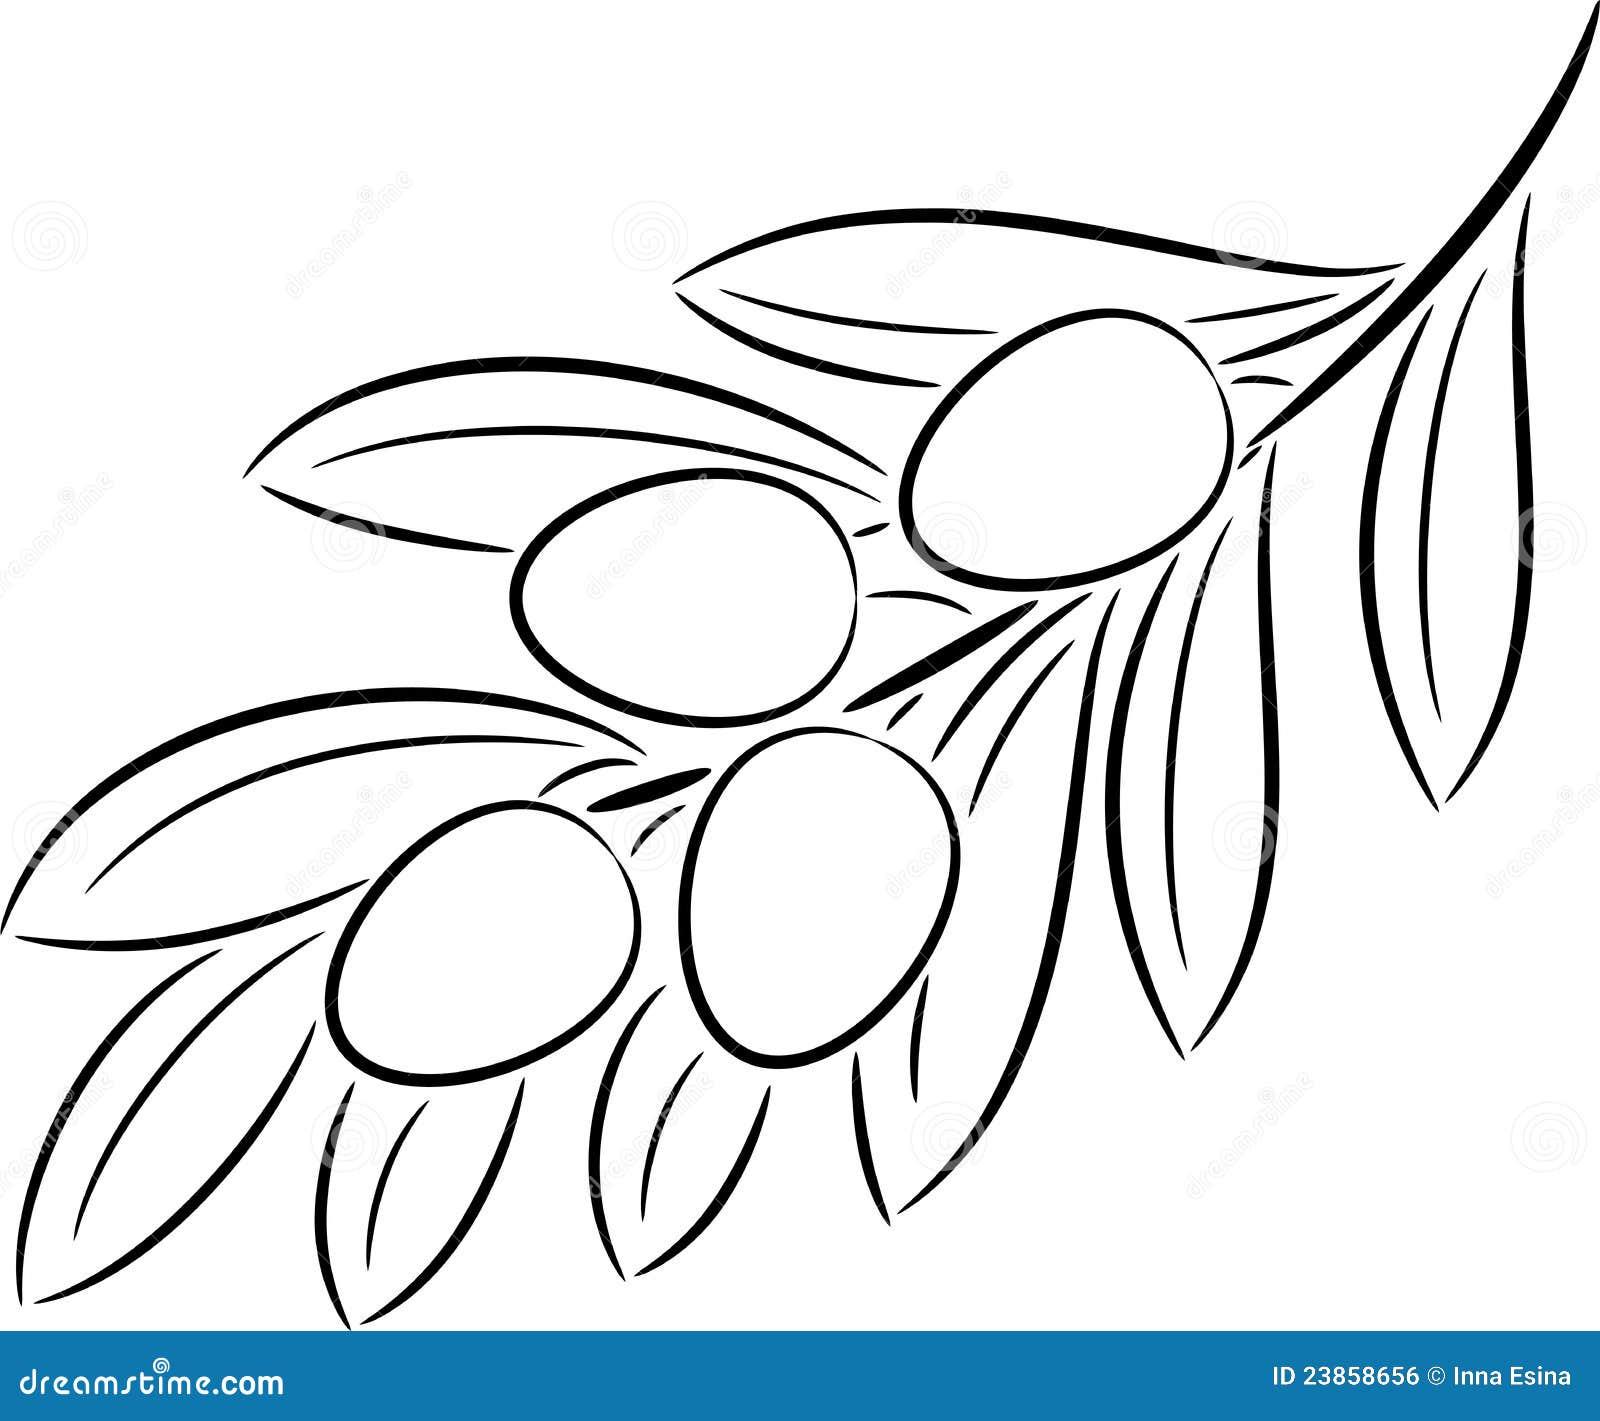 Short Vowel Worksheets 1st Grade 2 in addition Royalty Free Stock Image Olive Branch Image23858656 additionally Bryana Cuthbert wikispaces besides Skeleton label likewise Argon Nitrogen Aero Road Bike 2016. on art for nutrition